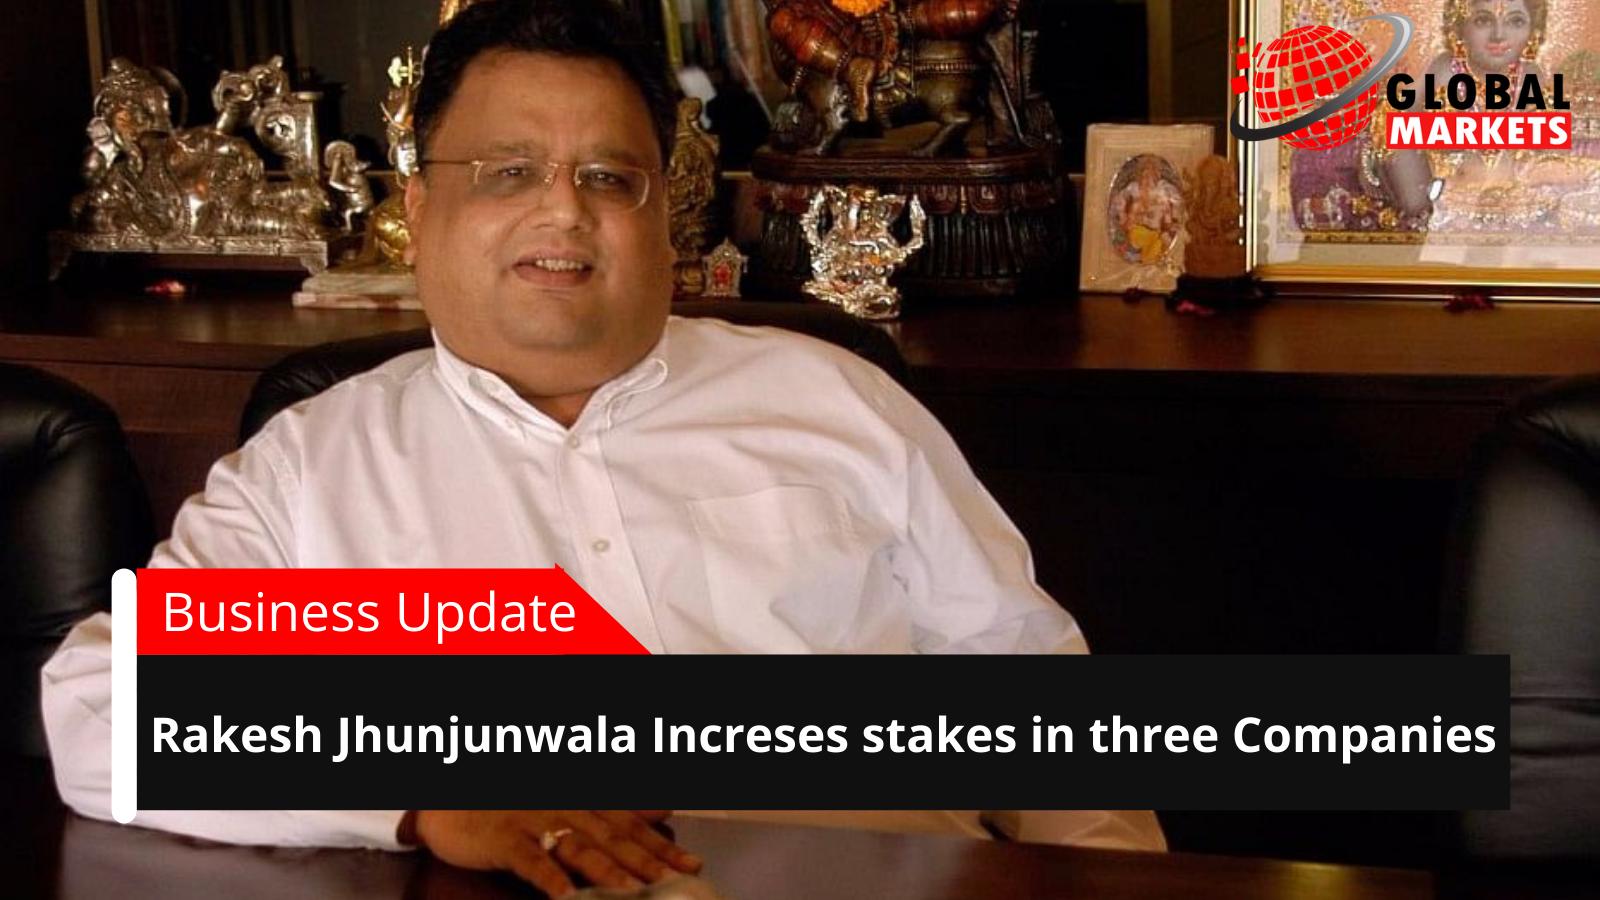 Rakesh Jhunjhunwala Increases  stake in three Companies